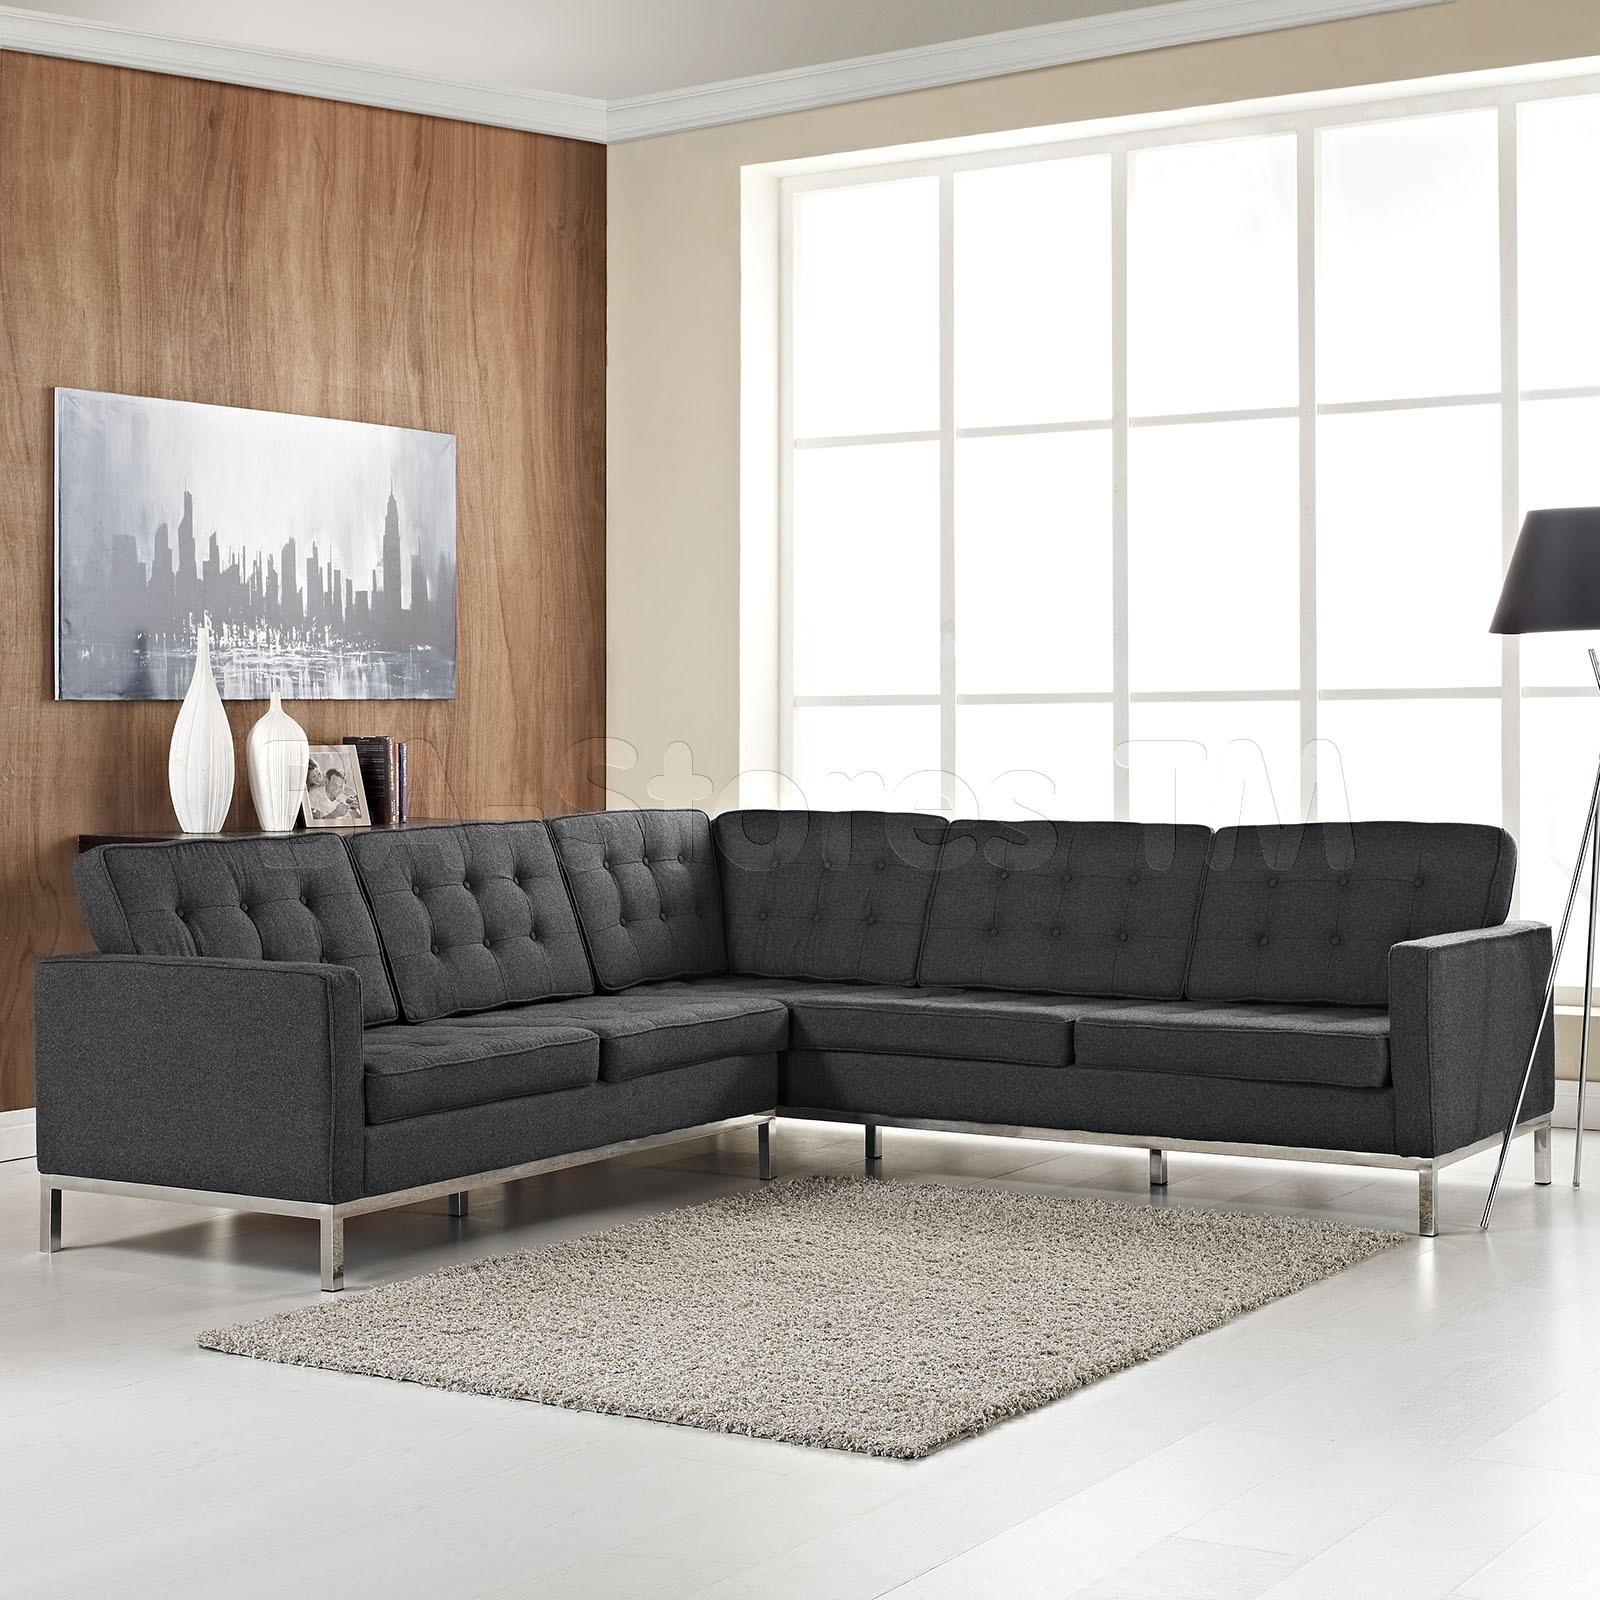 Beautiful L Shaped Sectional Sofas Contemporary Shape Sofa ~ Idolza Regarding Sleek Sectional Sofas (View 2 of 10)